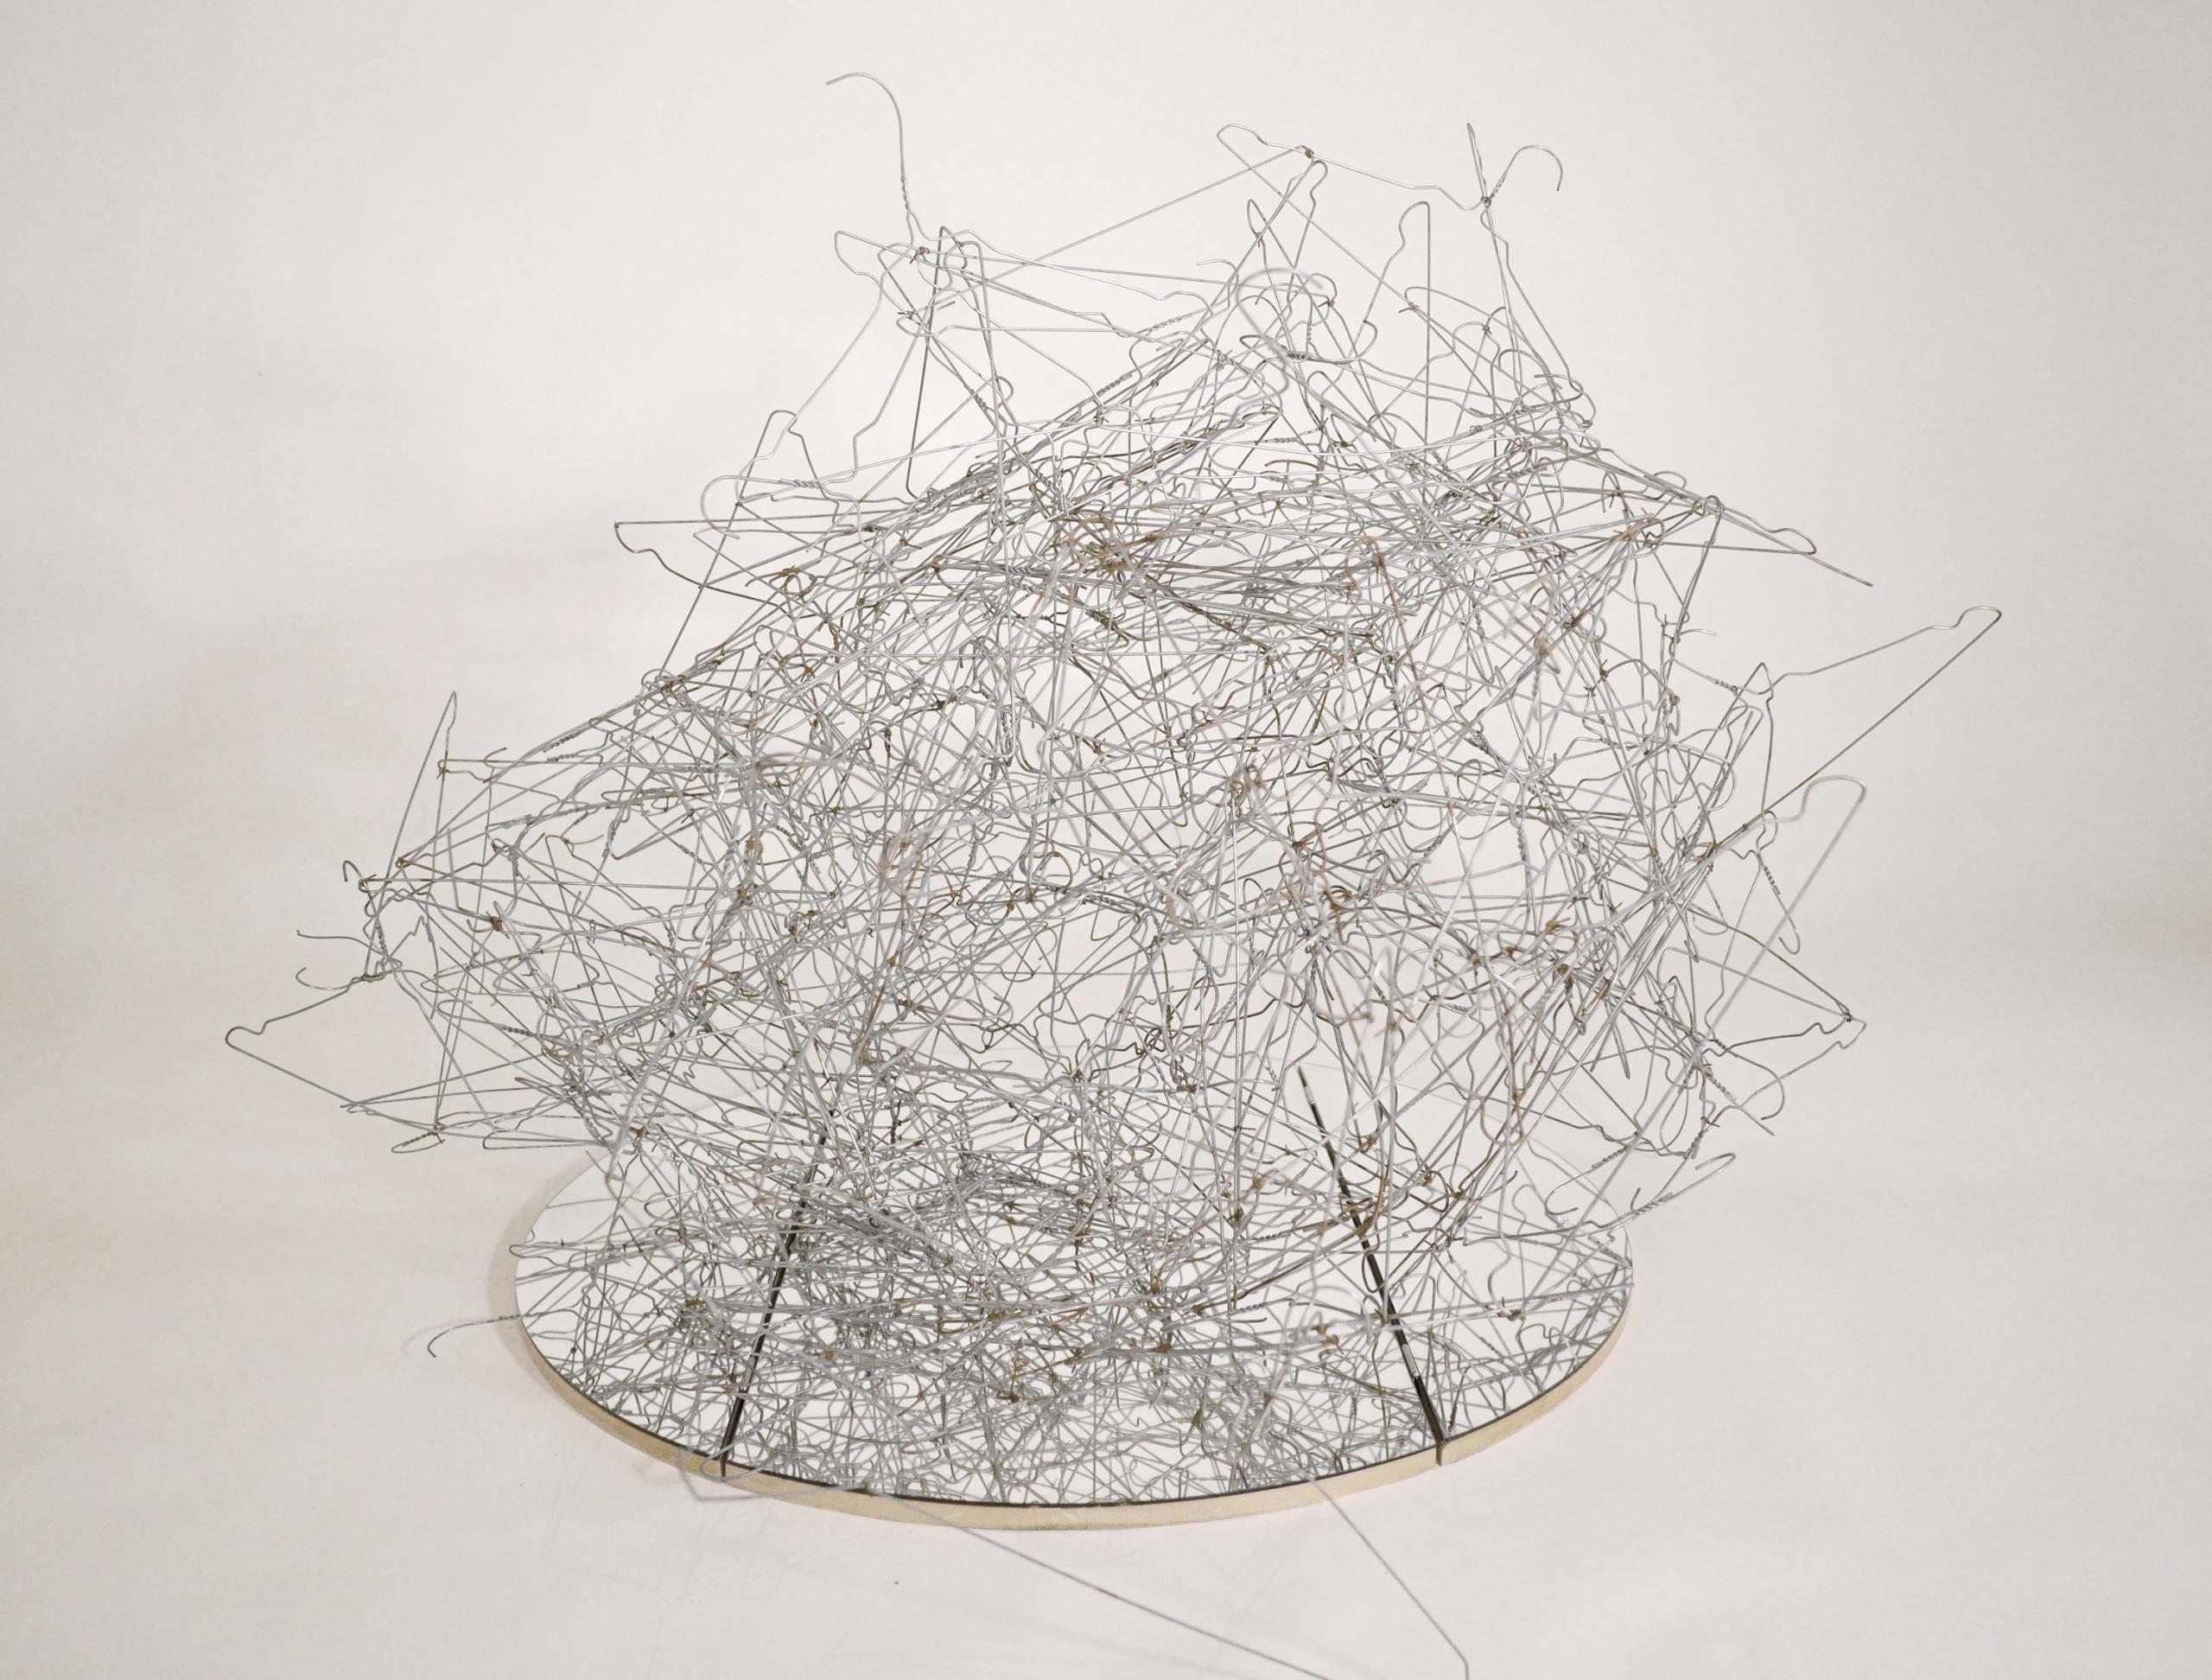 Bele Marx & Gilles Mussard, Ohne Titel / untitled